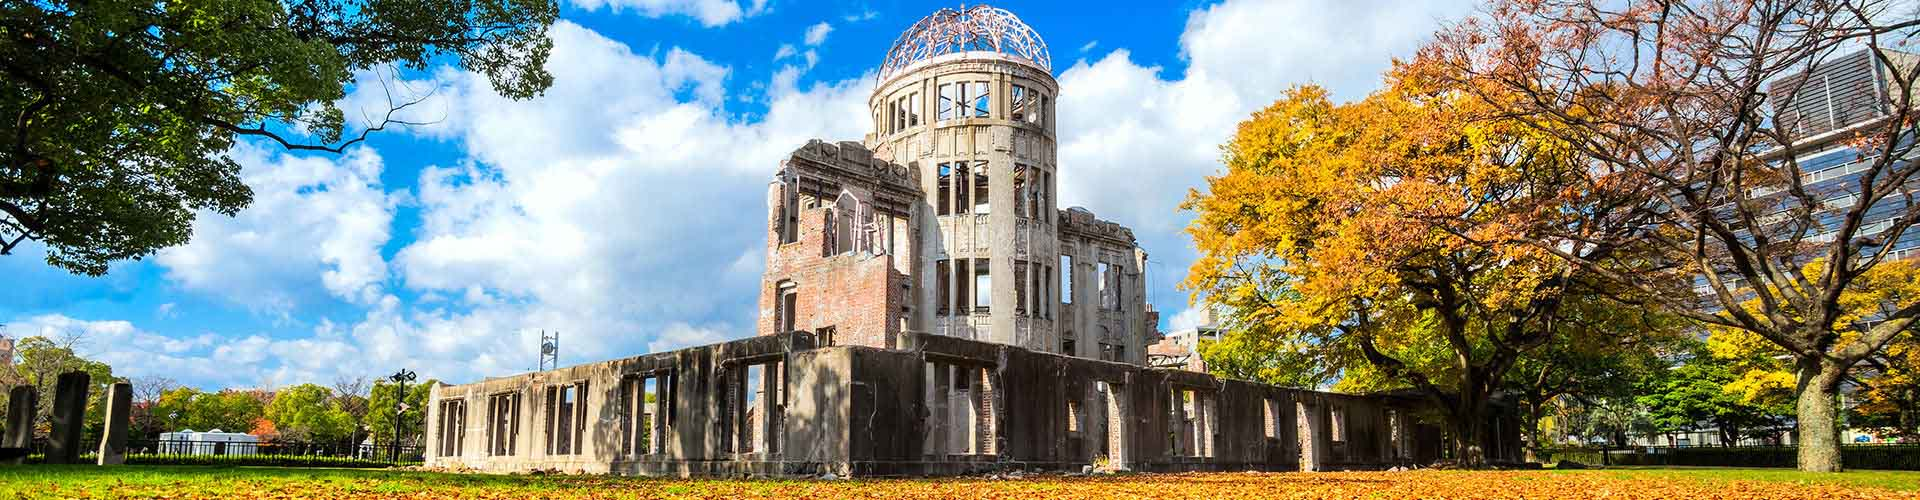 Hiroshima - Apartamentos en Hiroshima. Mapas de Hiroshima, Fotos y comentarios de cada Apartamento en Hiroshima.